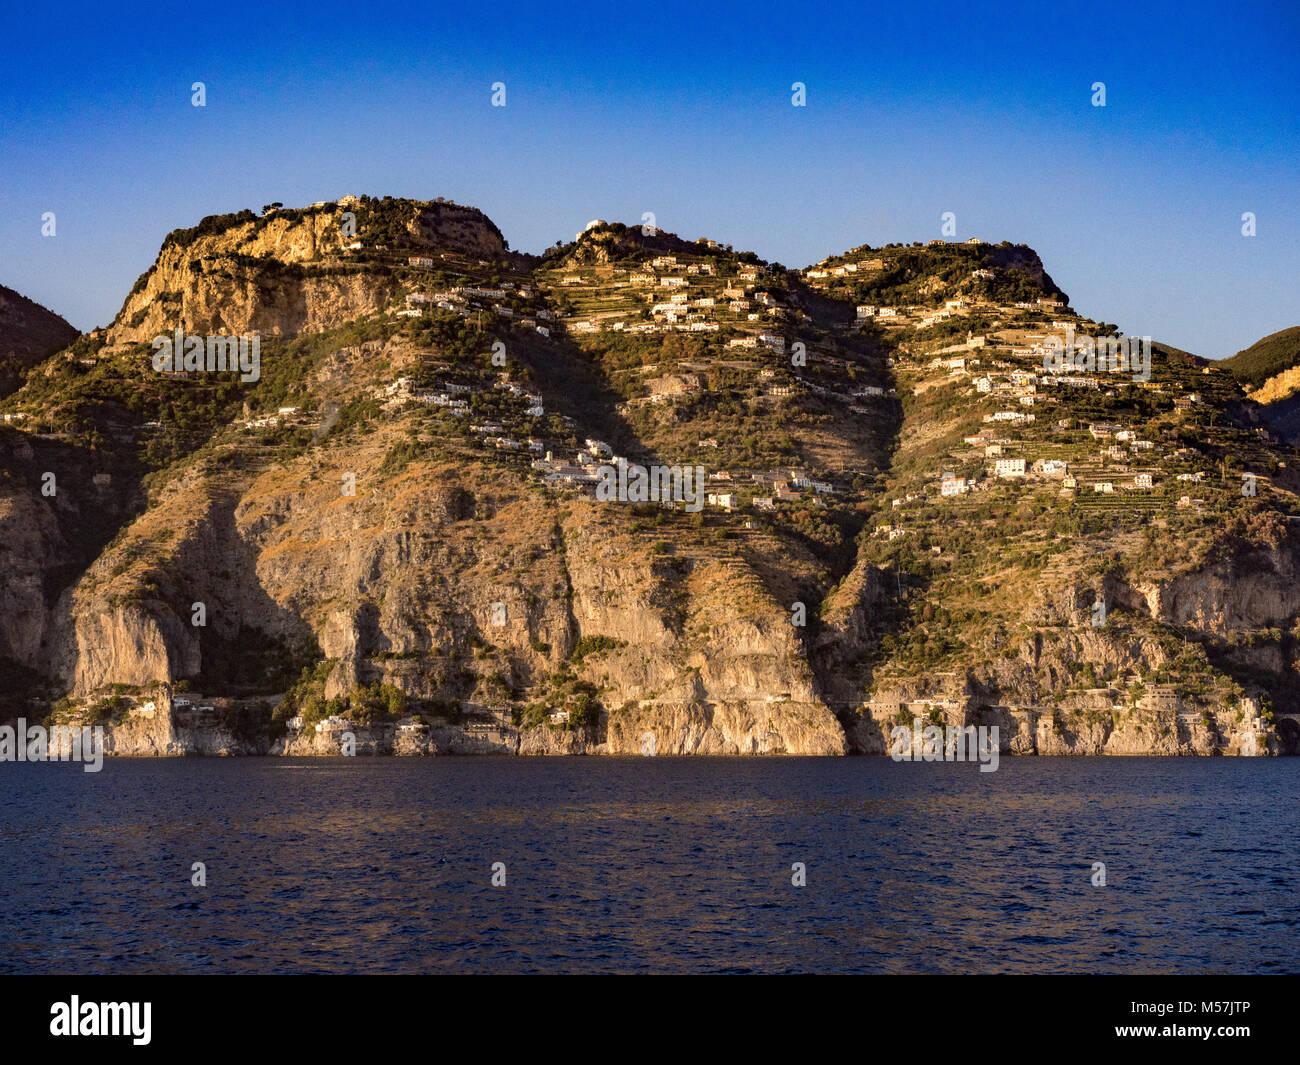 Amalfi coast with typical Italian buildings on hillside, Italy. - Stock Image